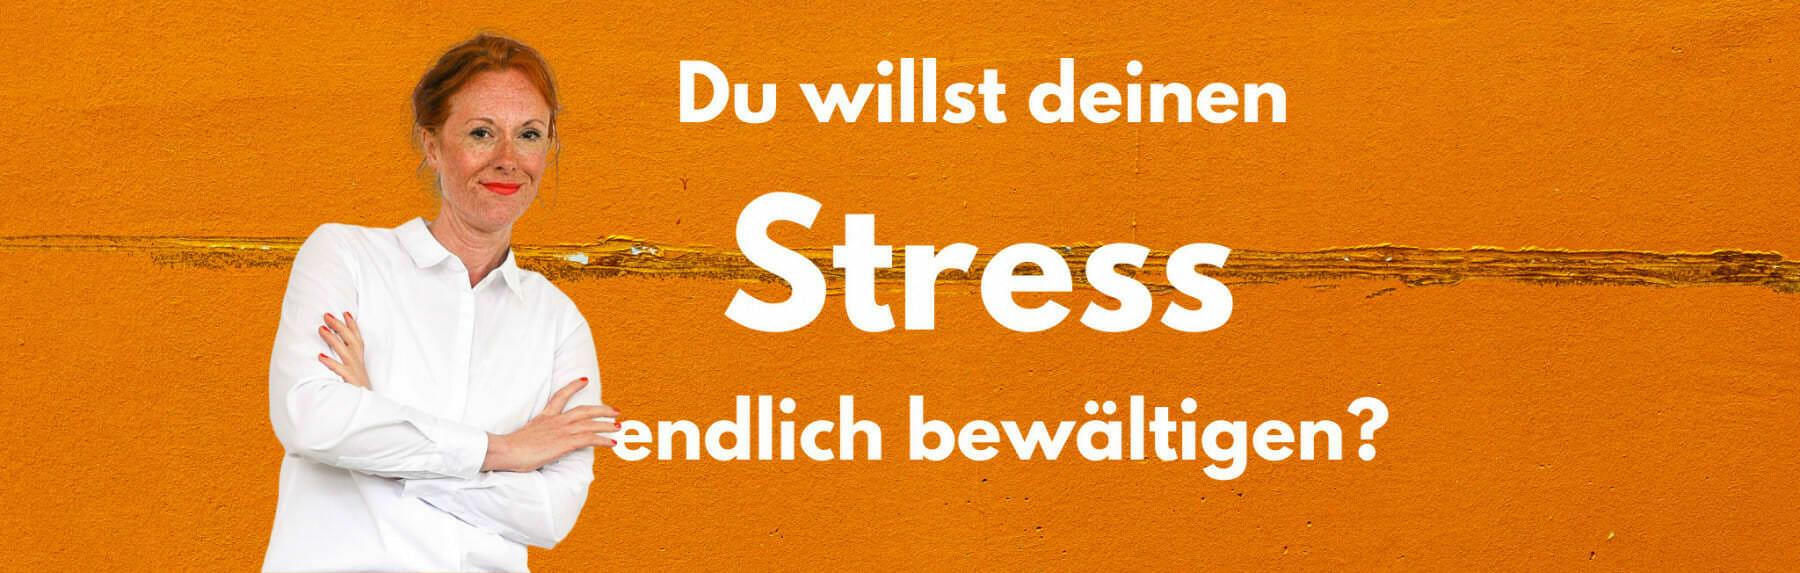 Stress bewältigen mit Julia, der Stress-Expertin